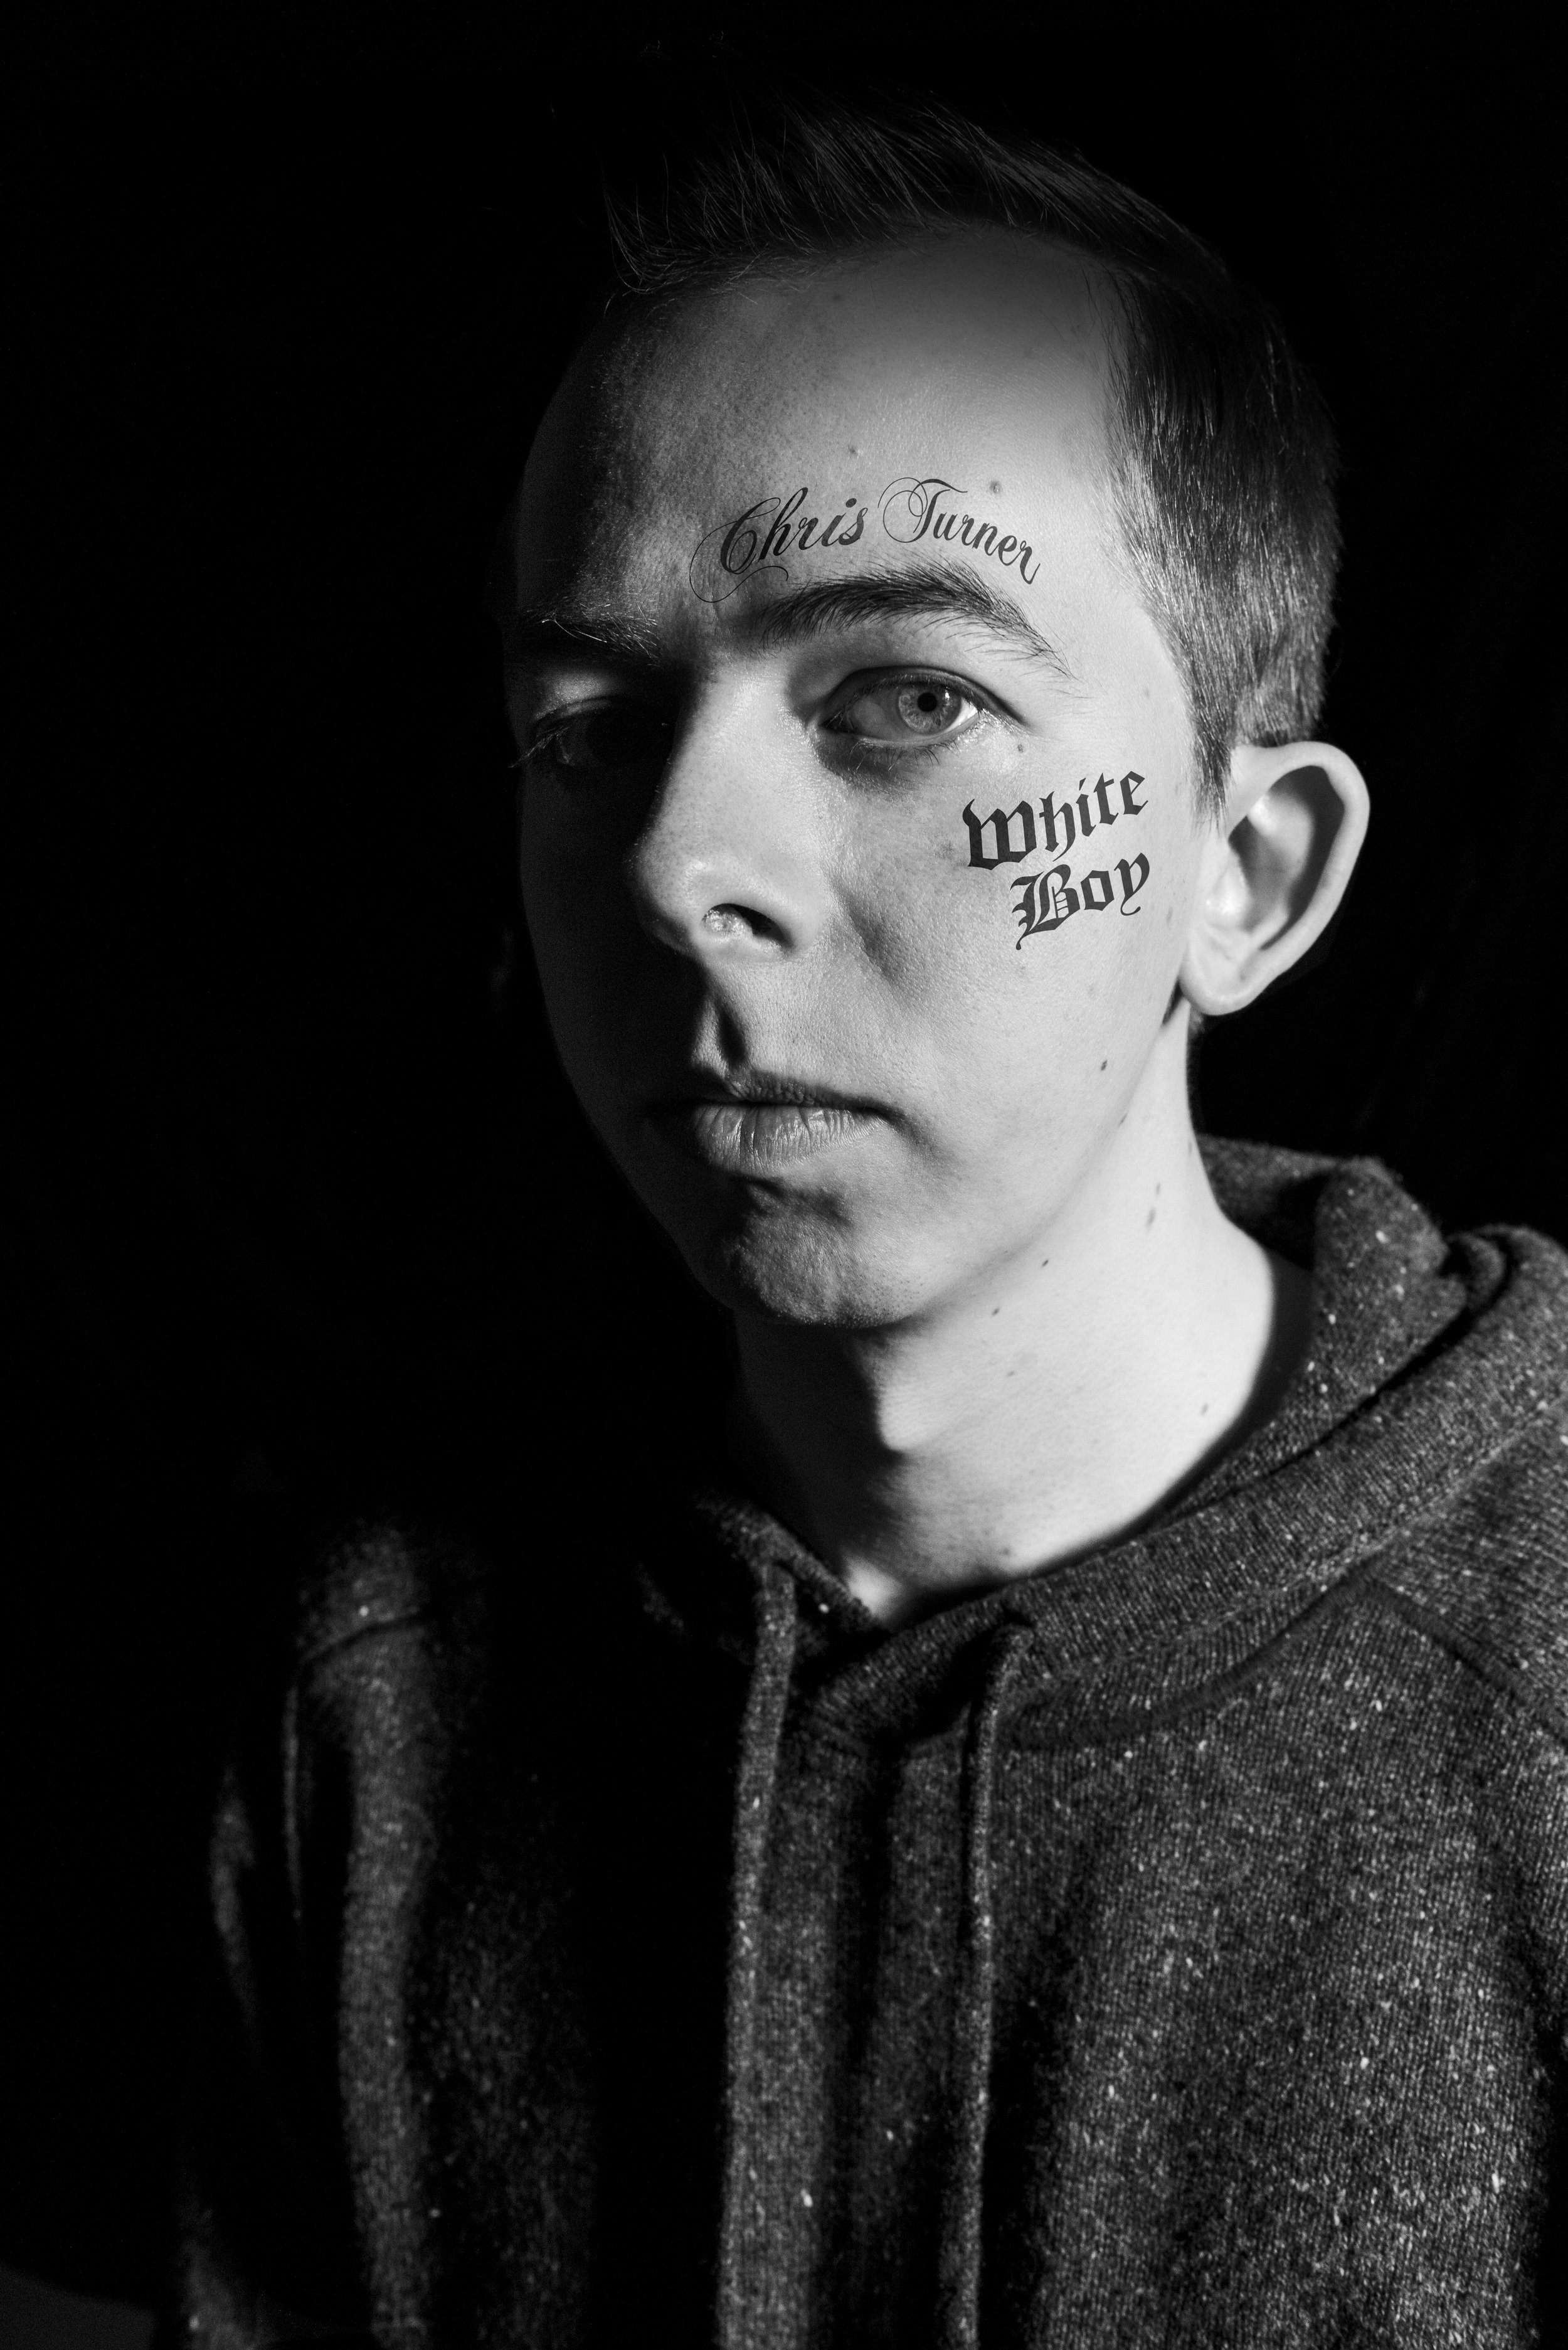 Chris Turner - White Boy.jpeg